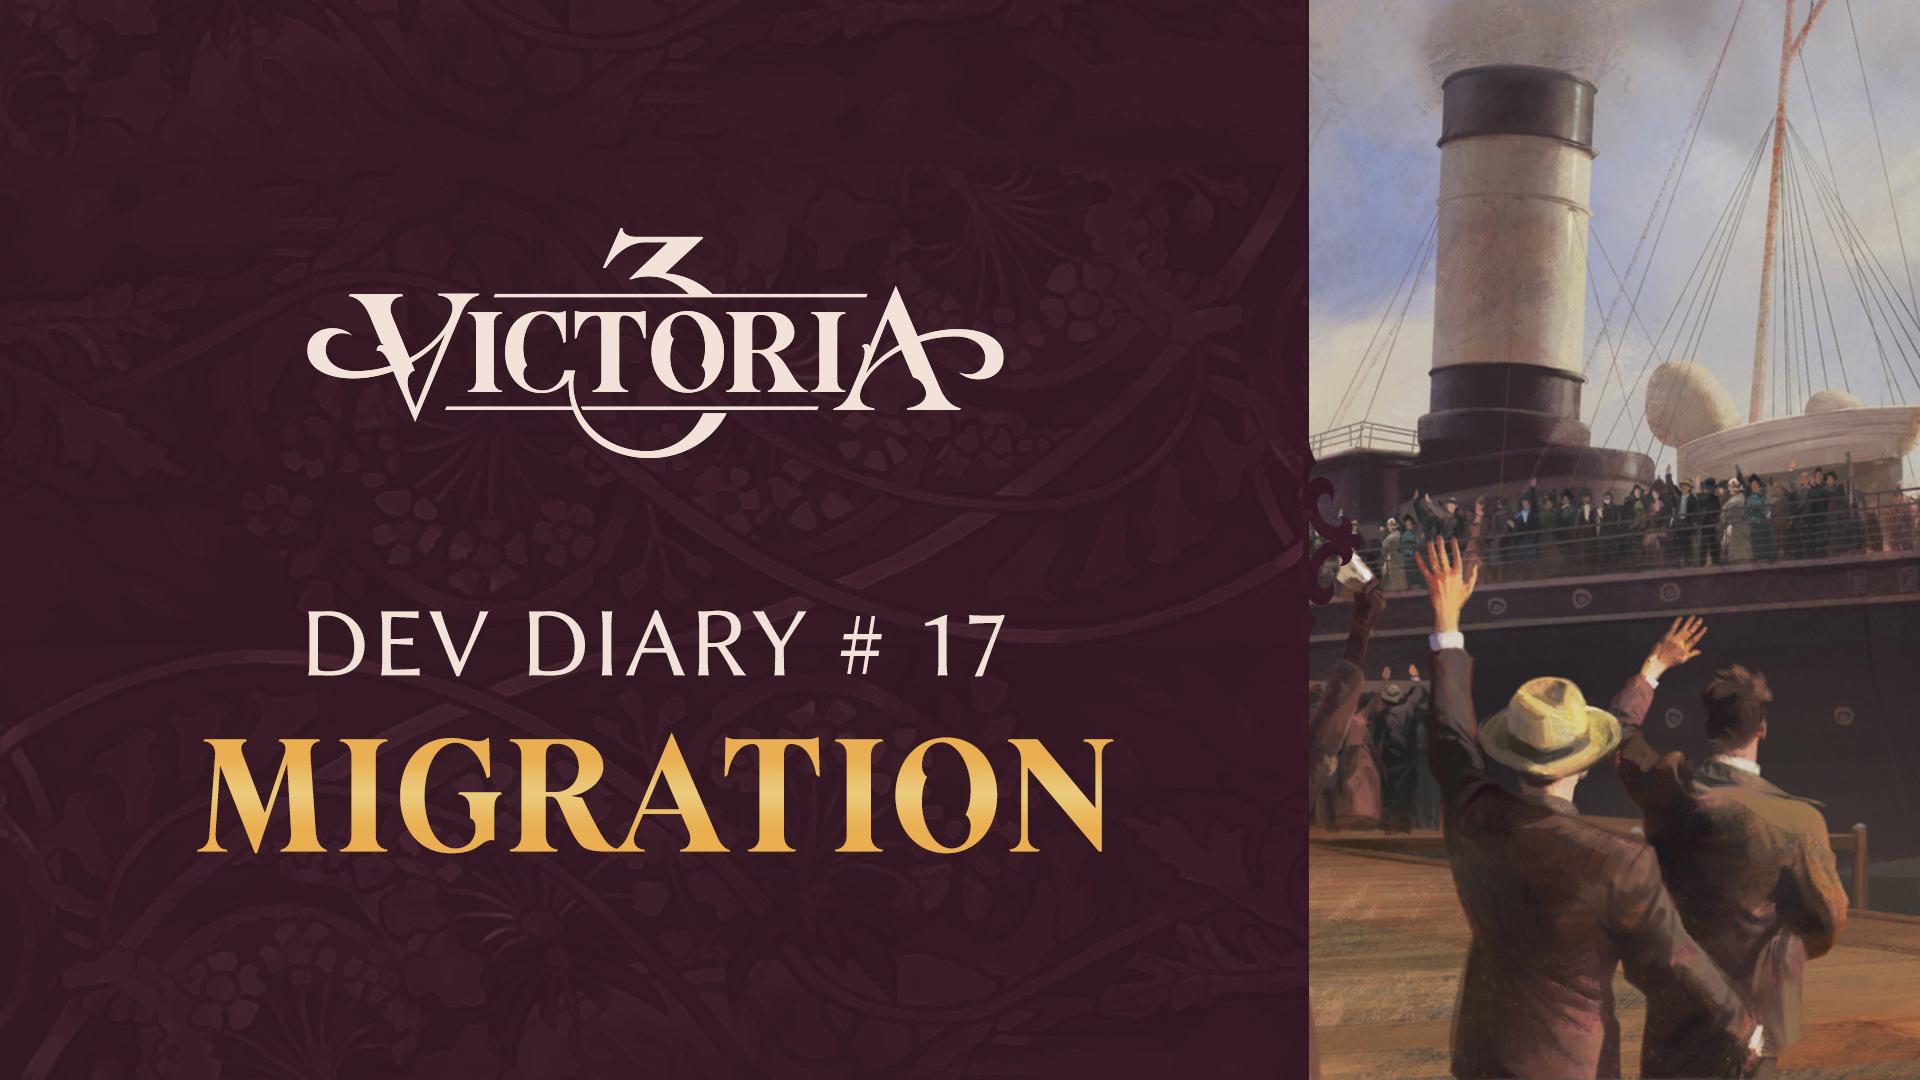 Dev Diary #17: Migration